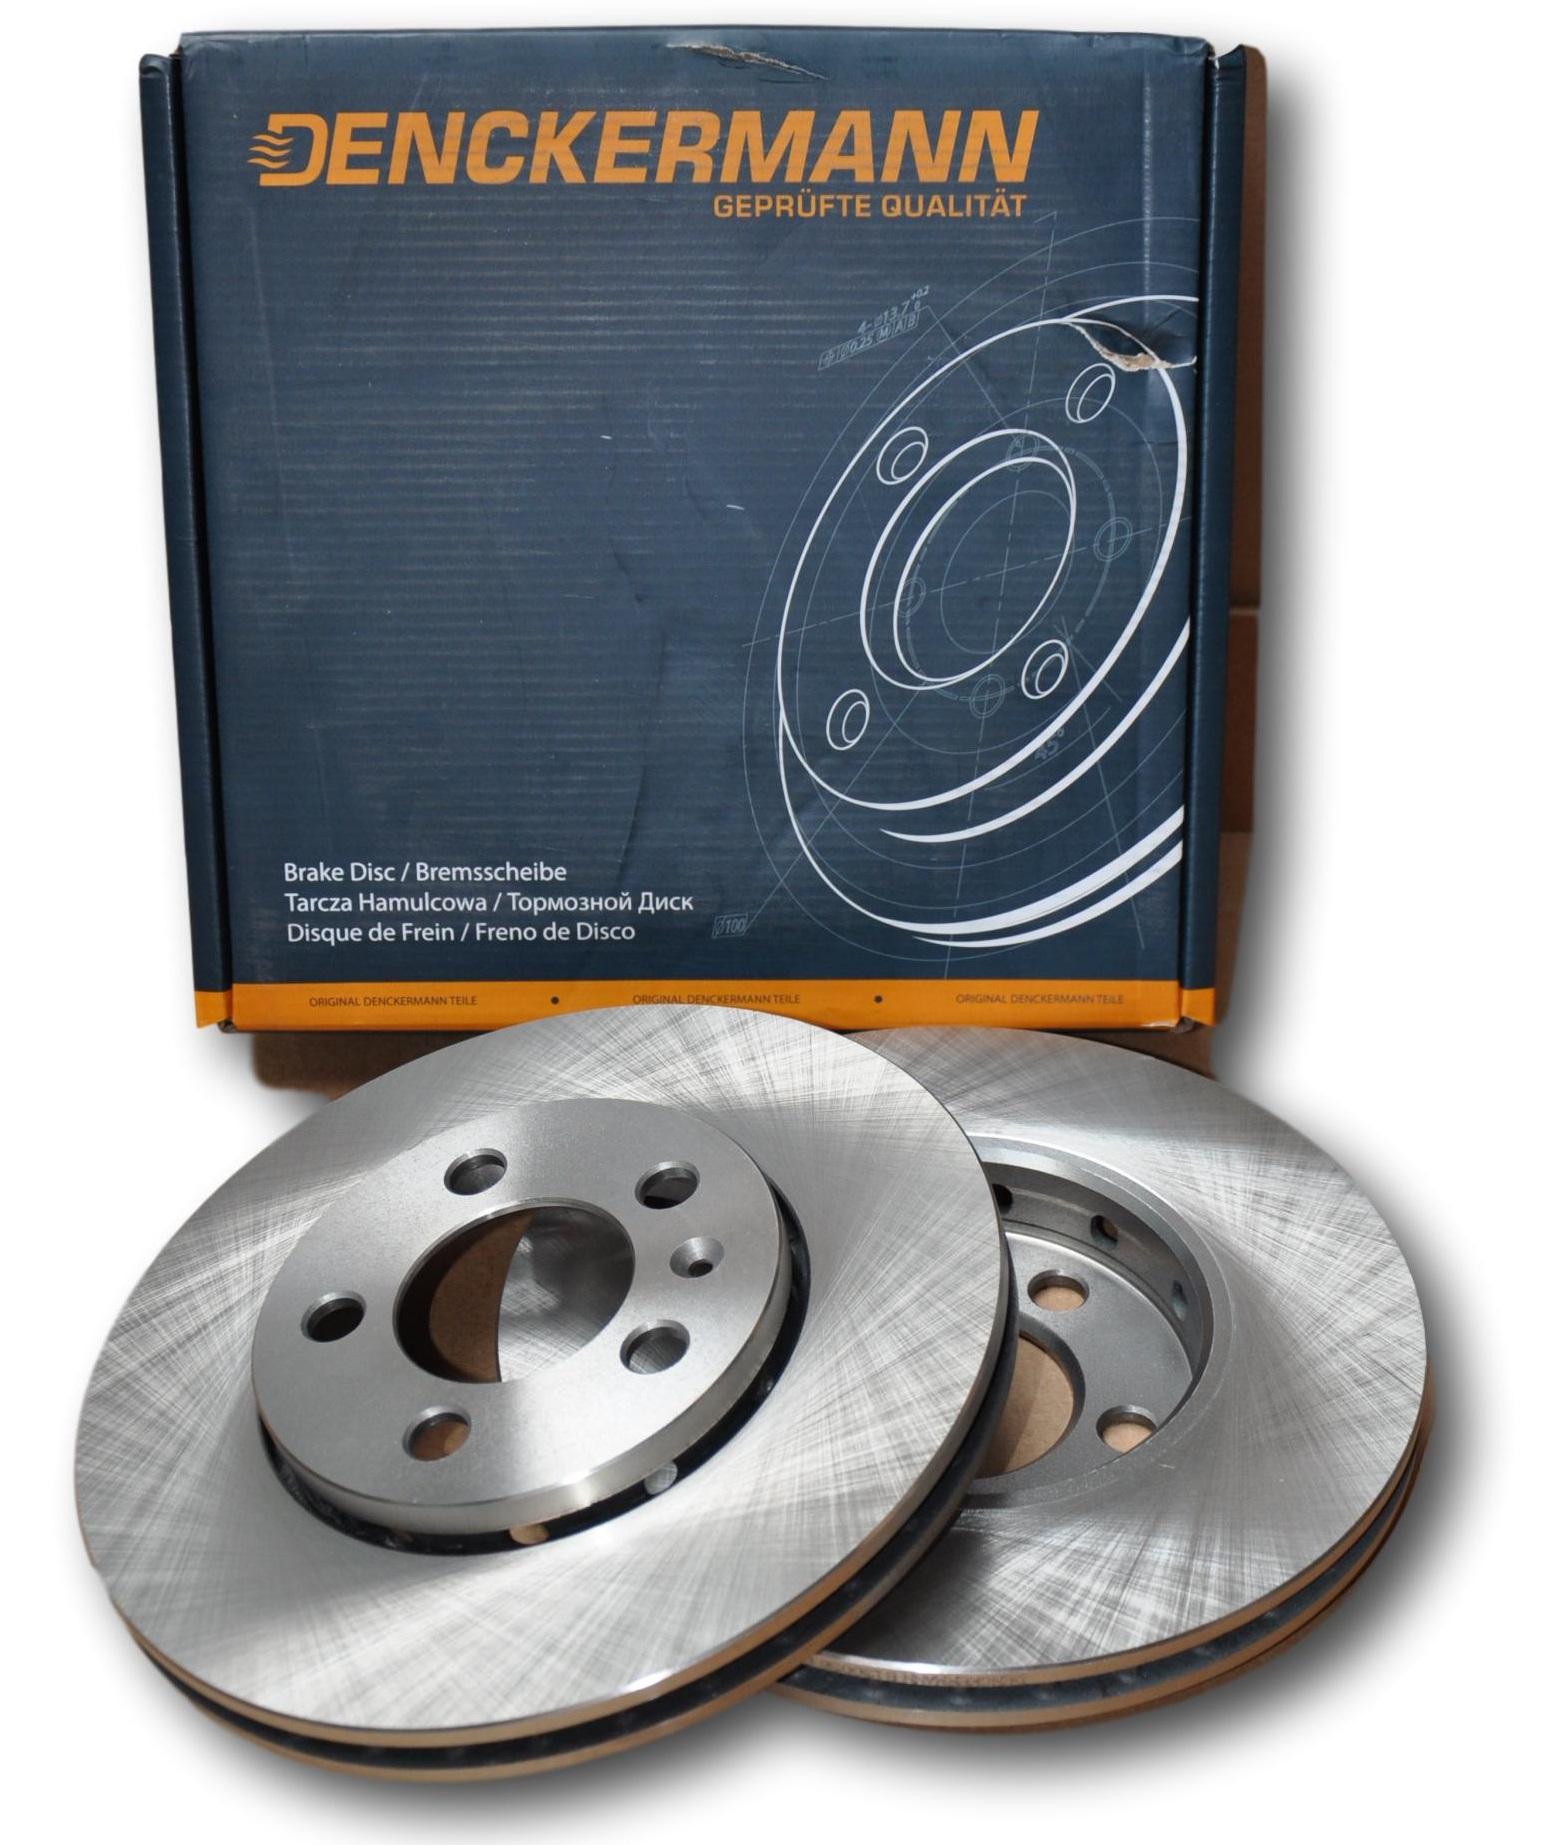 New Pck of 2 Brake Disc Blue Print ADB114336 Febi Bilston